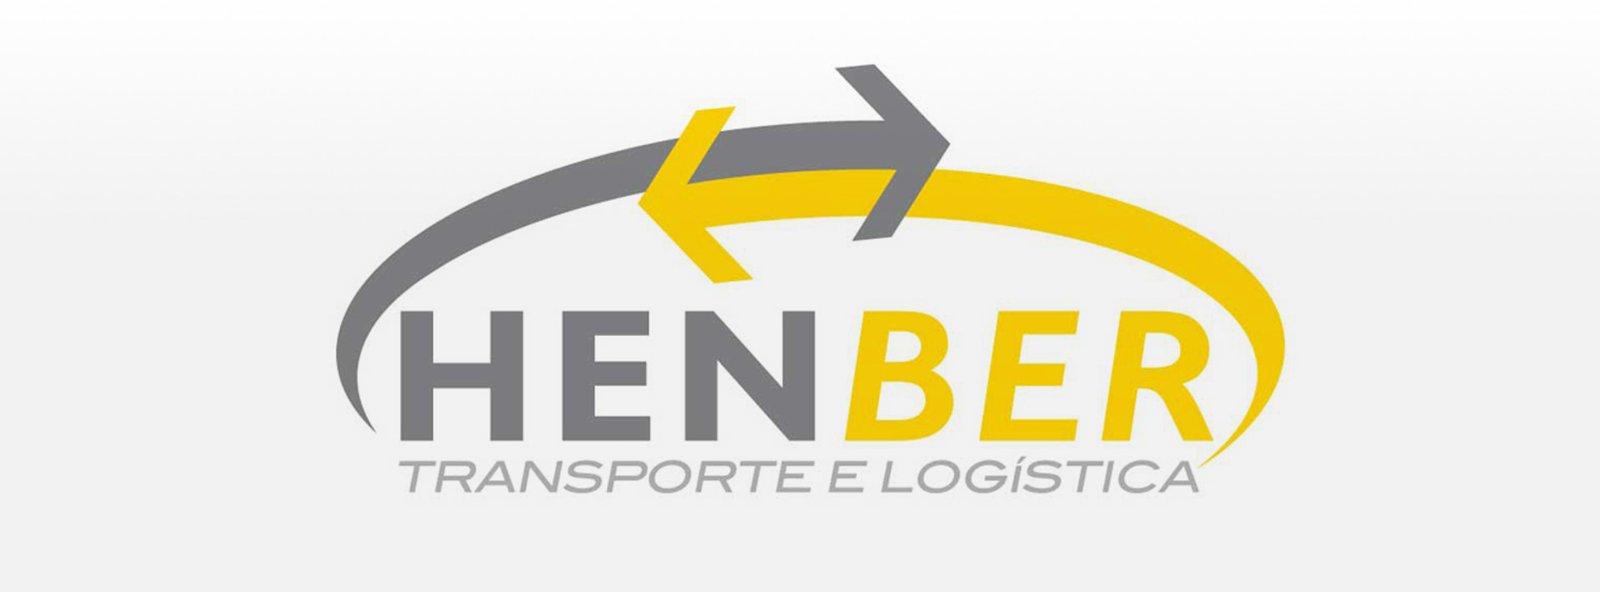 henber-1